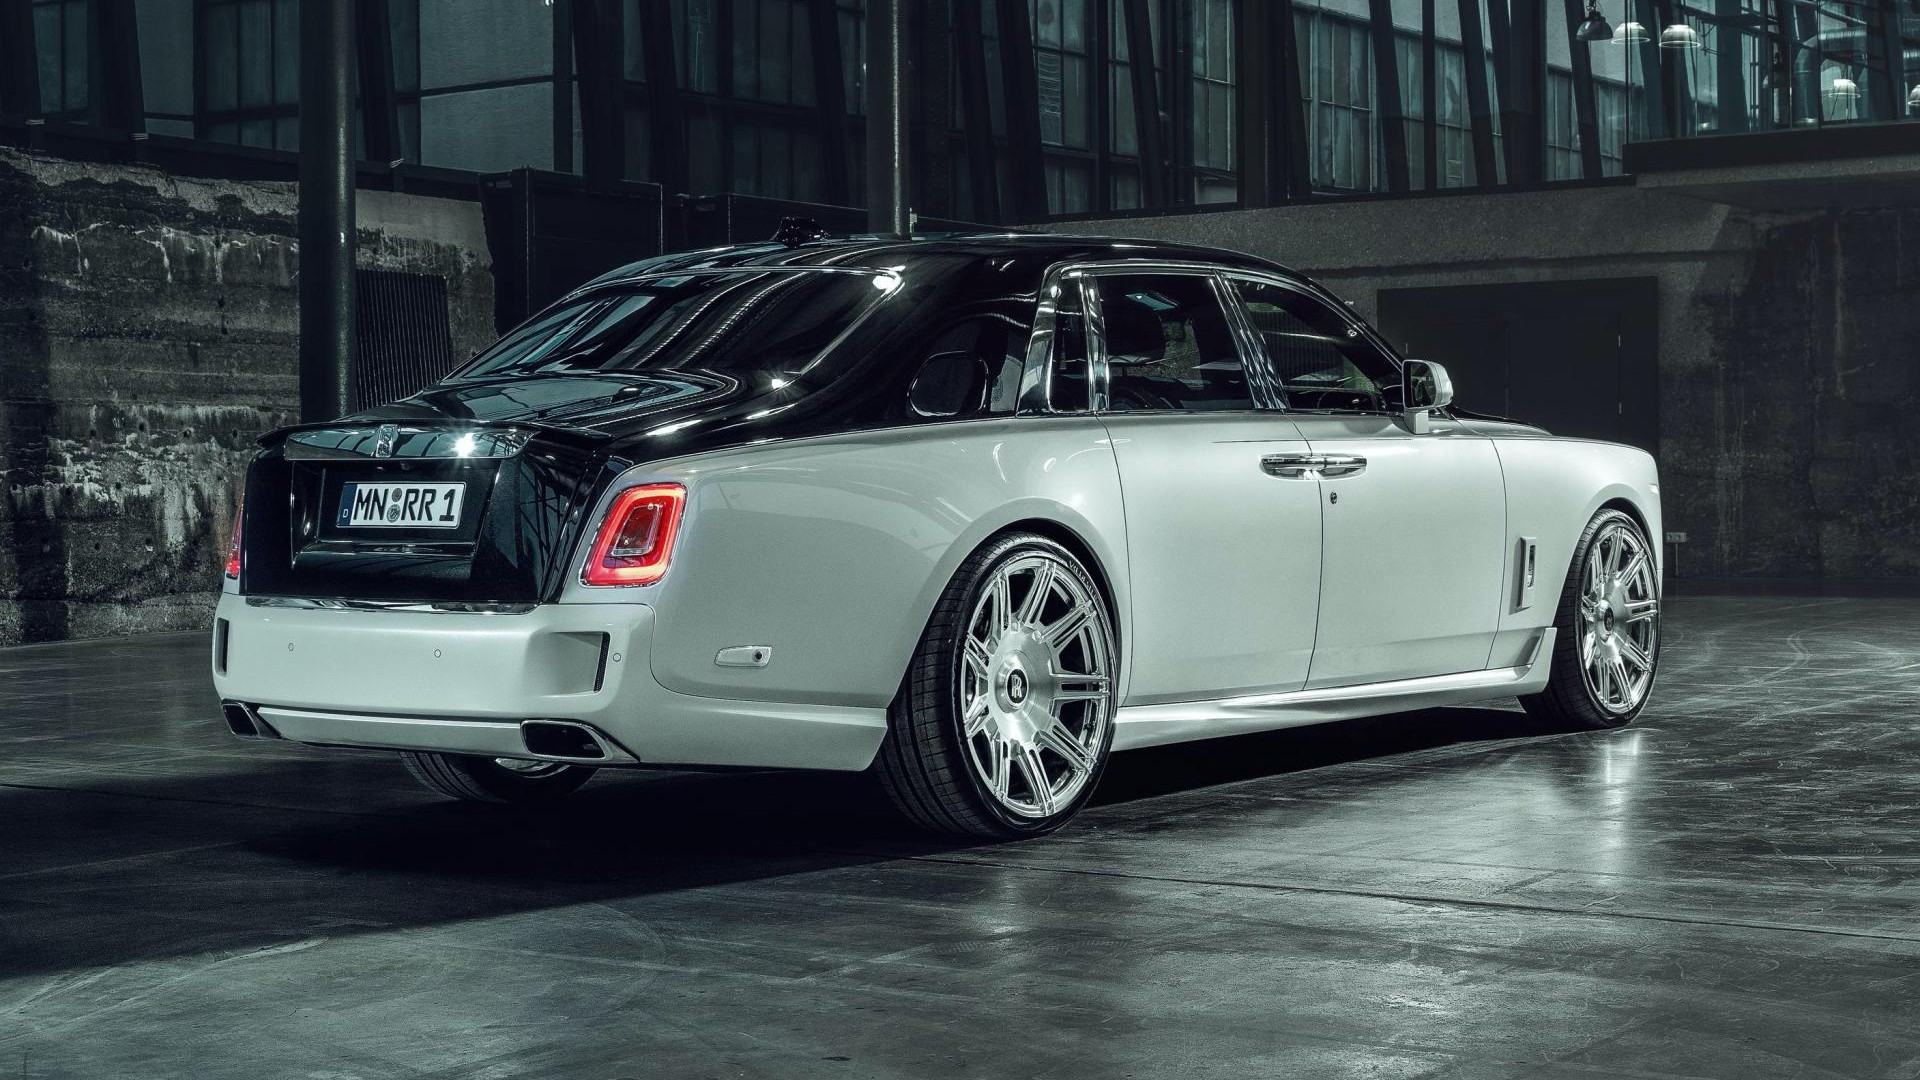 Rolls Royce Phantom Novitec Spofec (15)